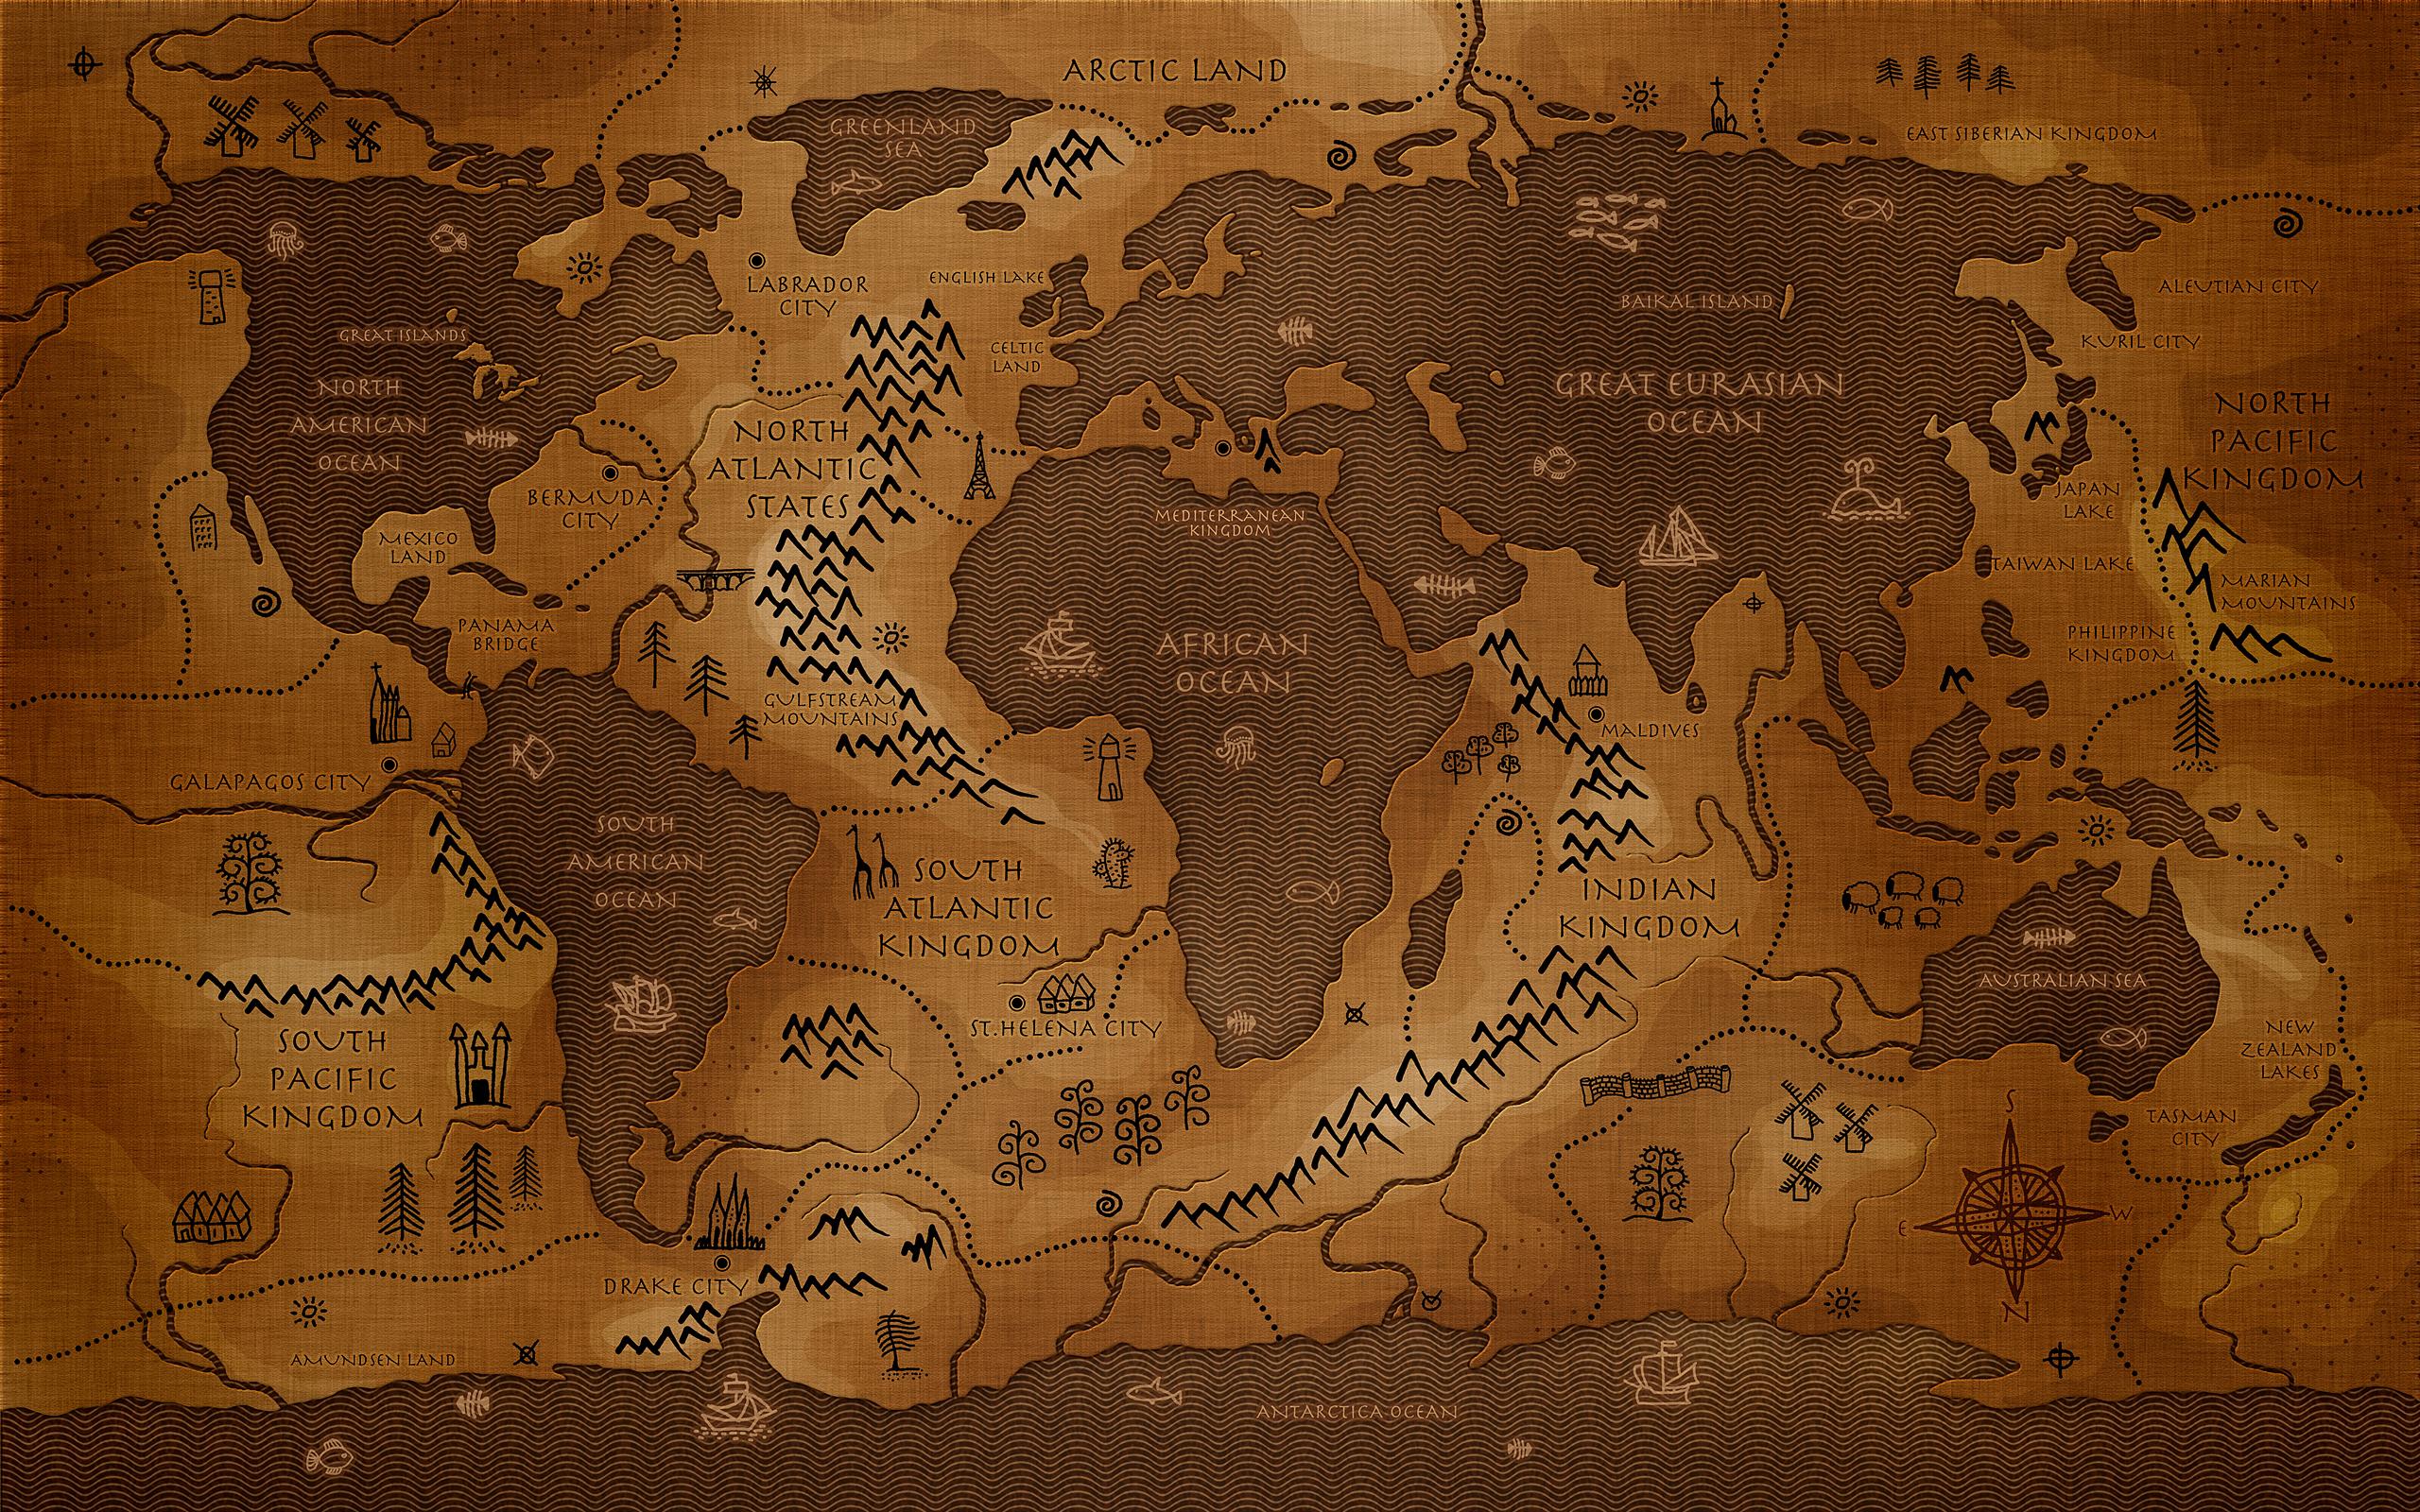 kb jpeg world map 1920 x 1200 642 kb jpeg vintage old world map 1600 x 2560x1600